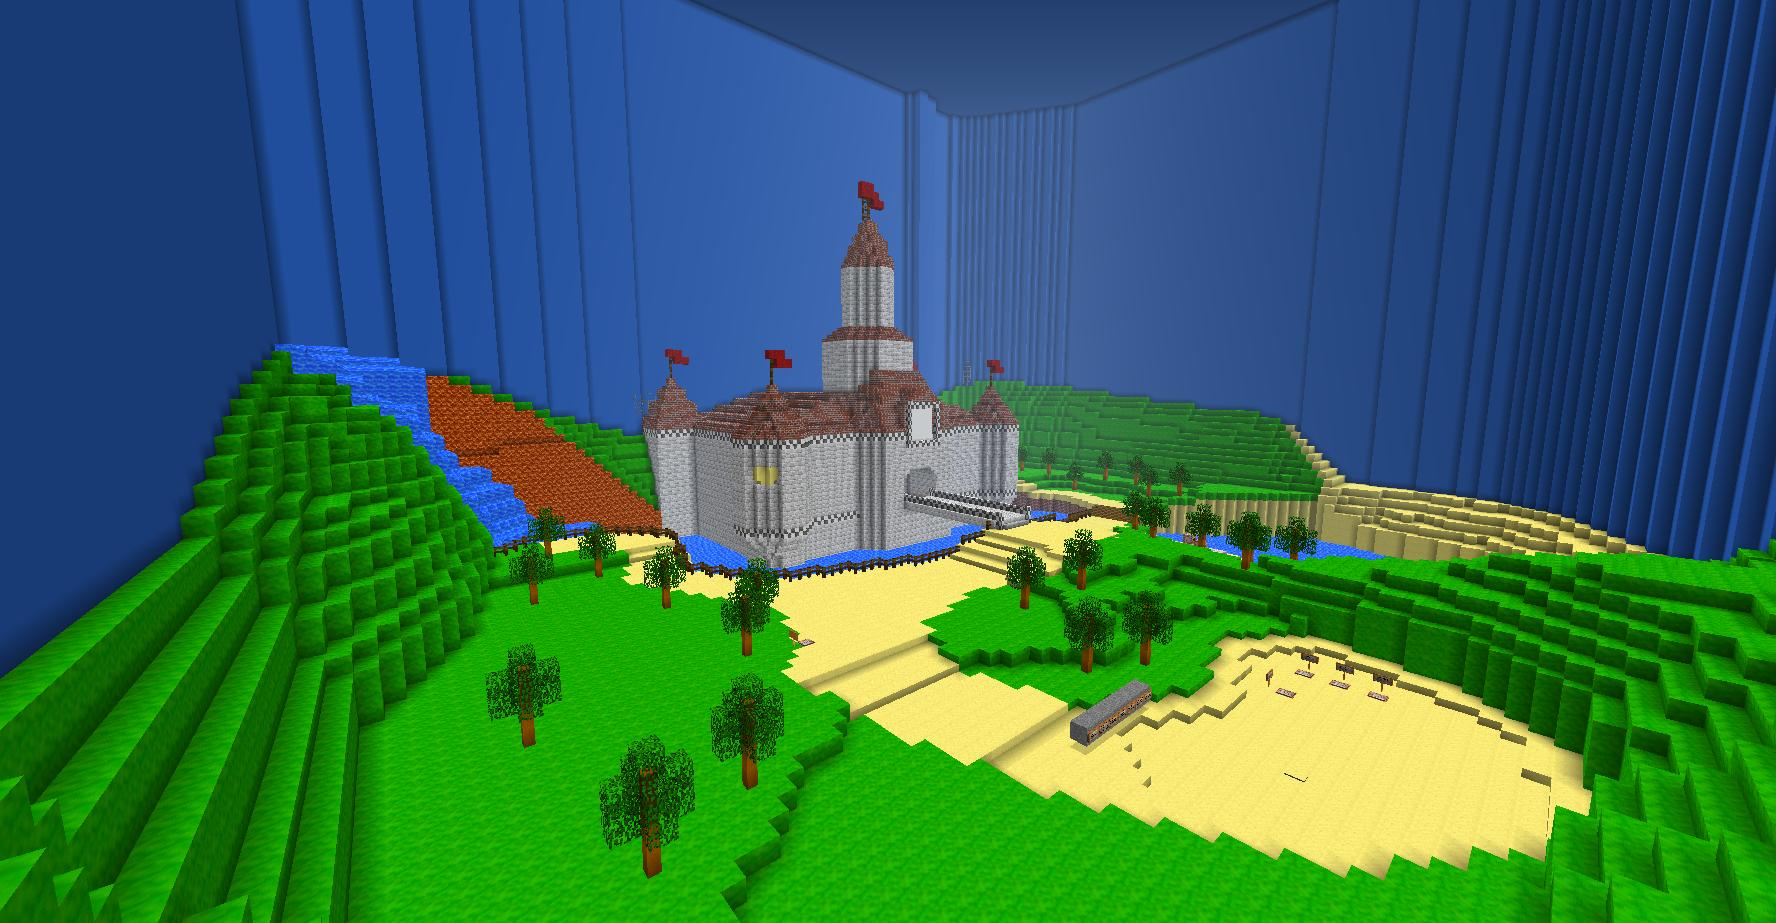 Mario 64: The Mushroom Castle 2 | Minecraft Pixel Art | Know